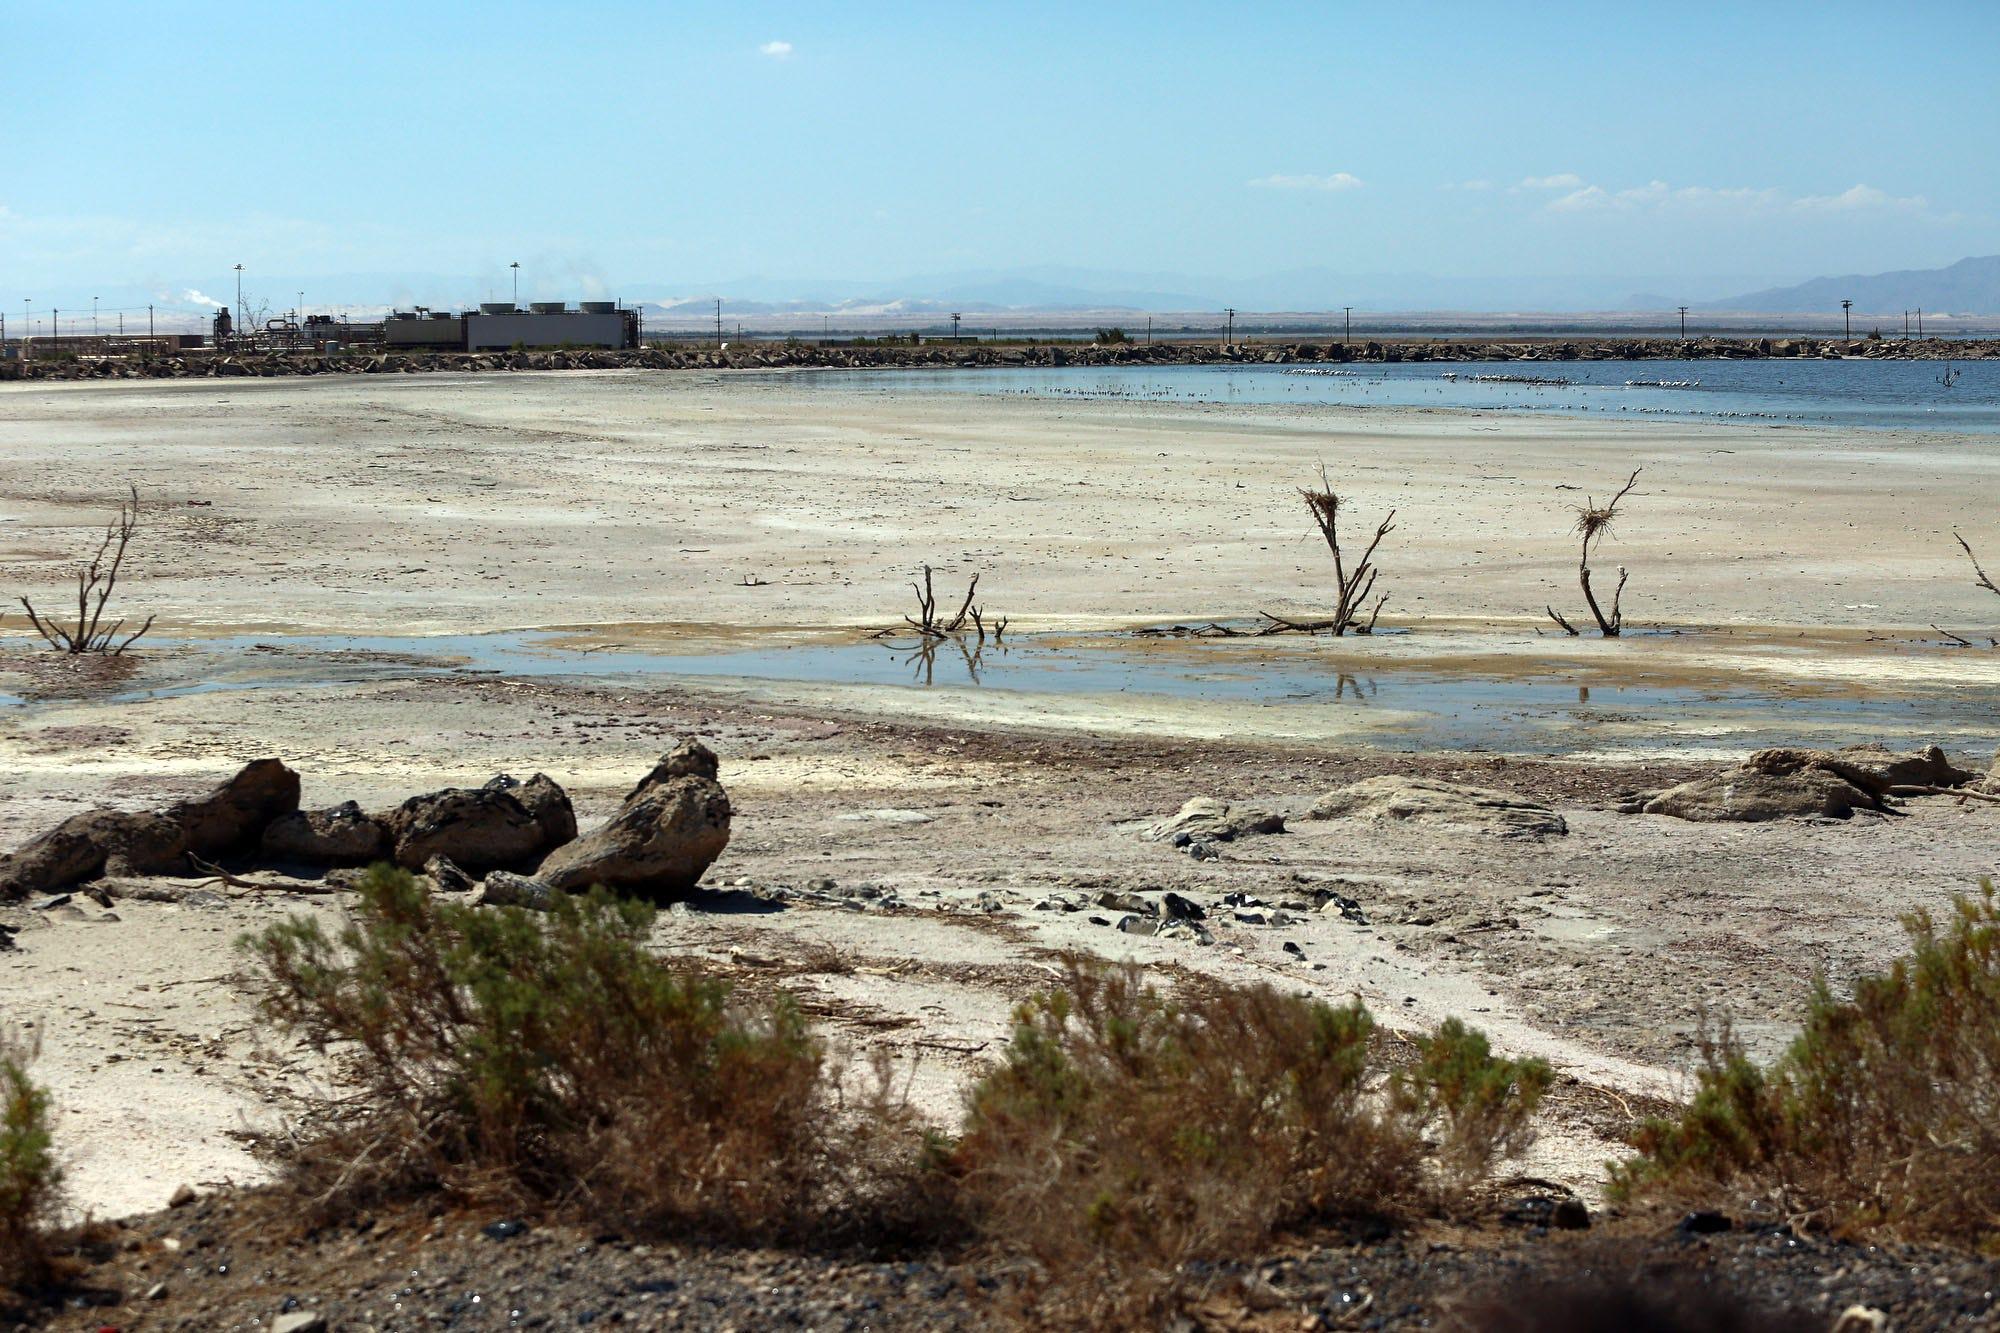 File:ISS-40 Salton Sea.jpg - Wikimedia Commons